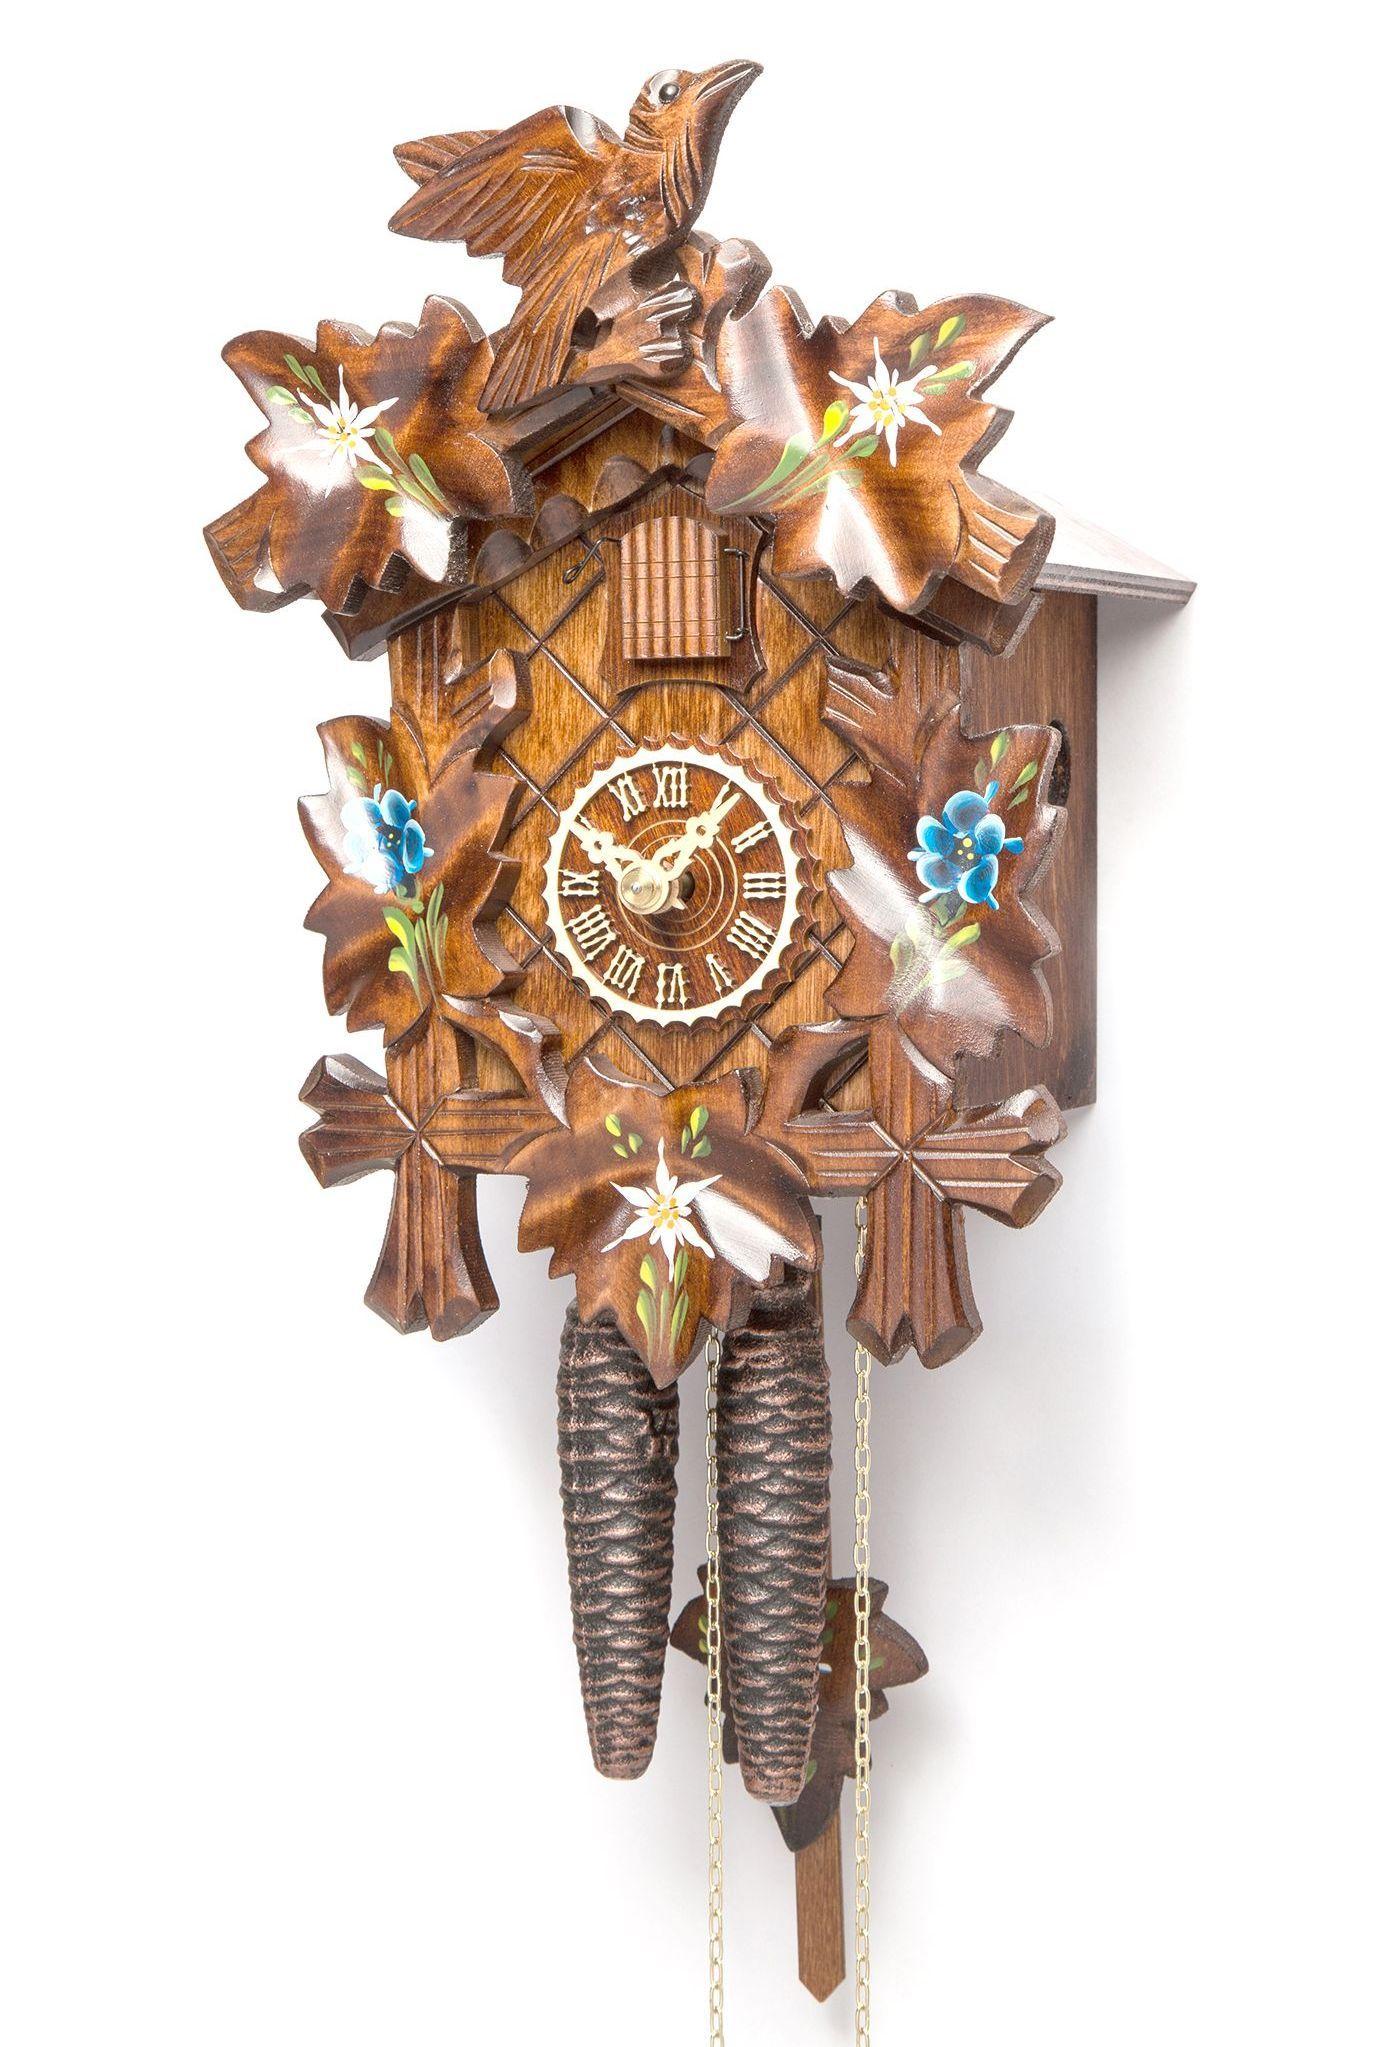 Часы настенные Часы настенные с кукушкой Tomas Stern 5010 chasy-nastennye-s-kukushkoy-tomas-stern-5010-germaniya.jpg